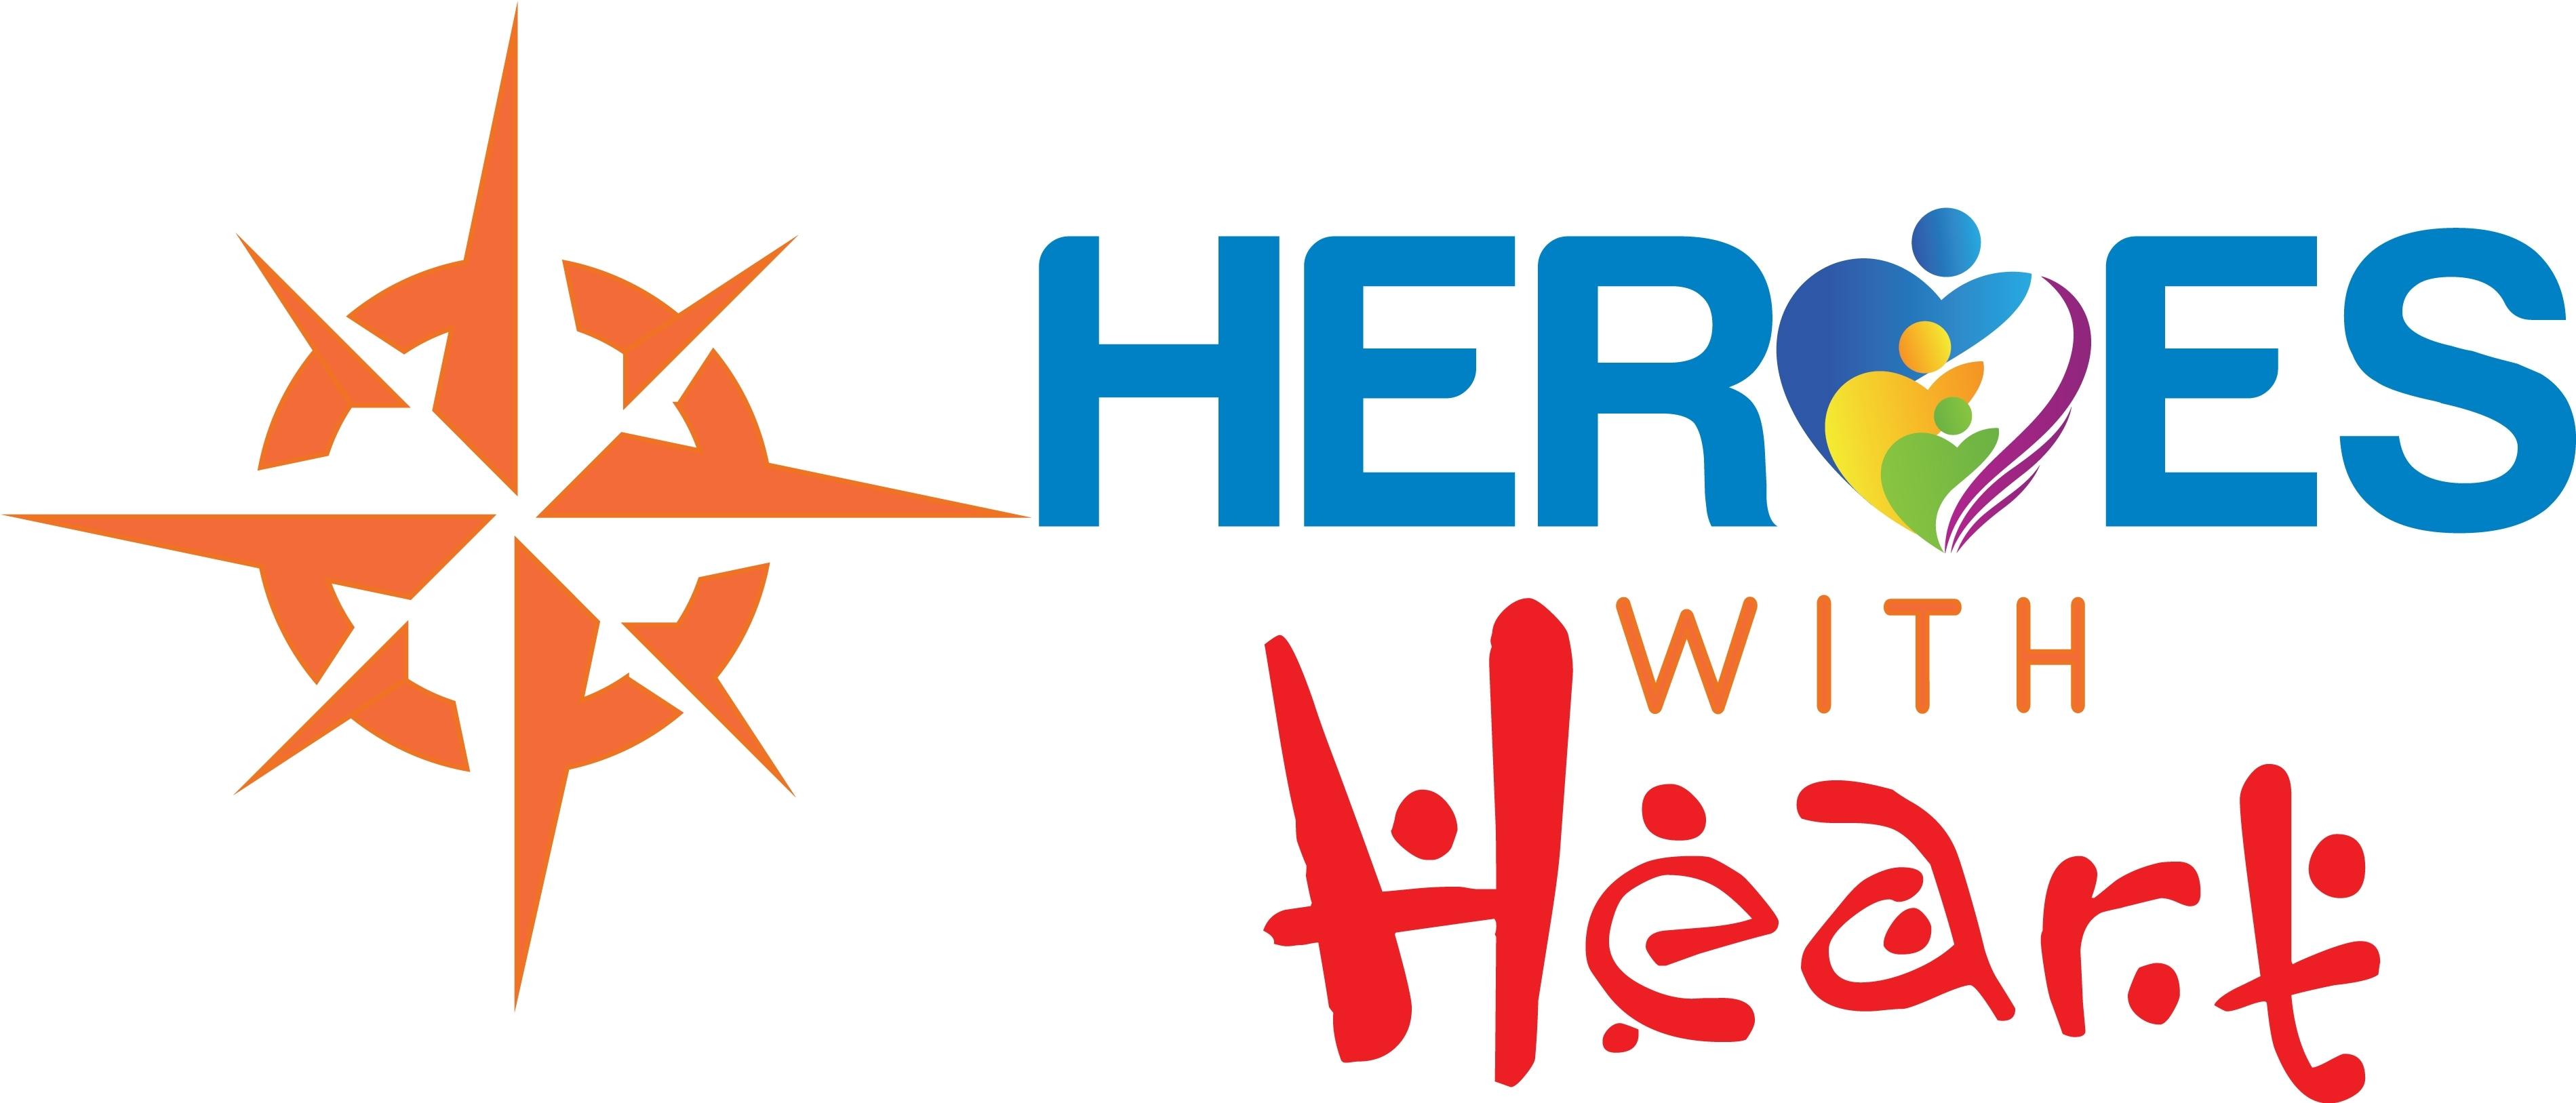 638ef673457ae80a3eab_Heroes_with_Heart.jpg